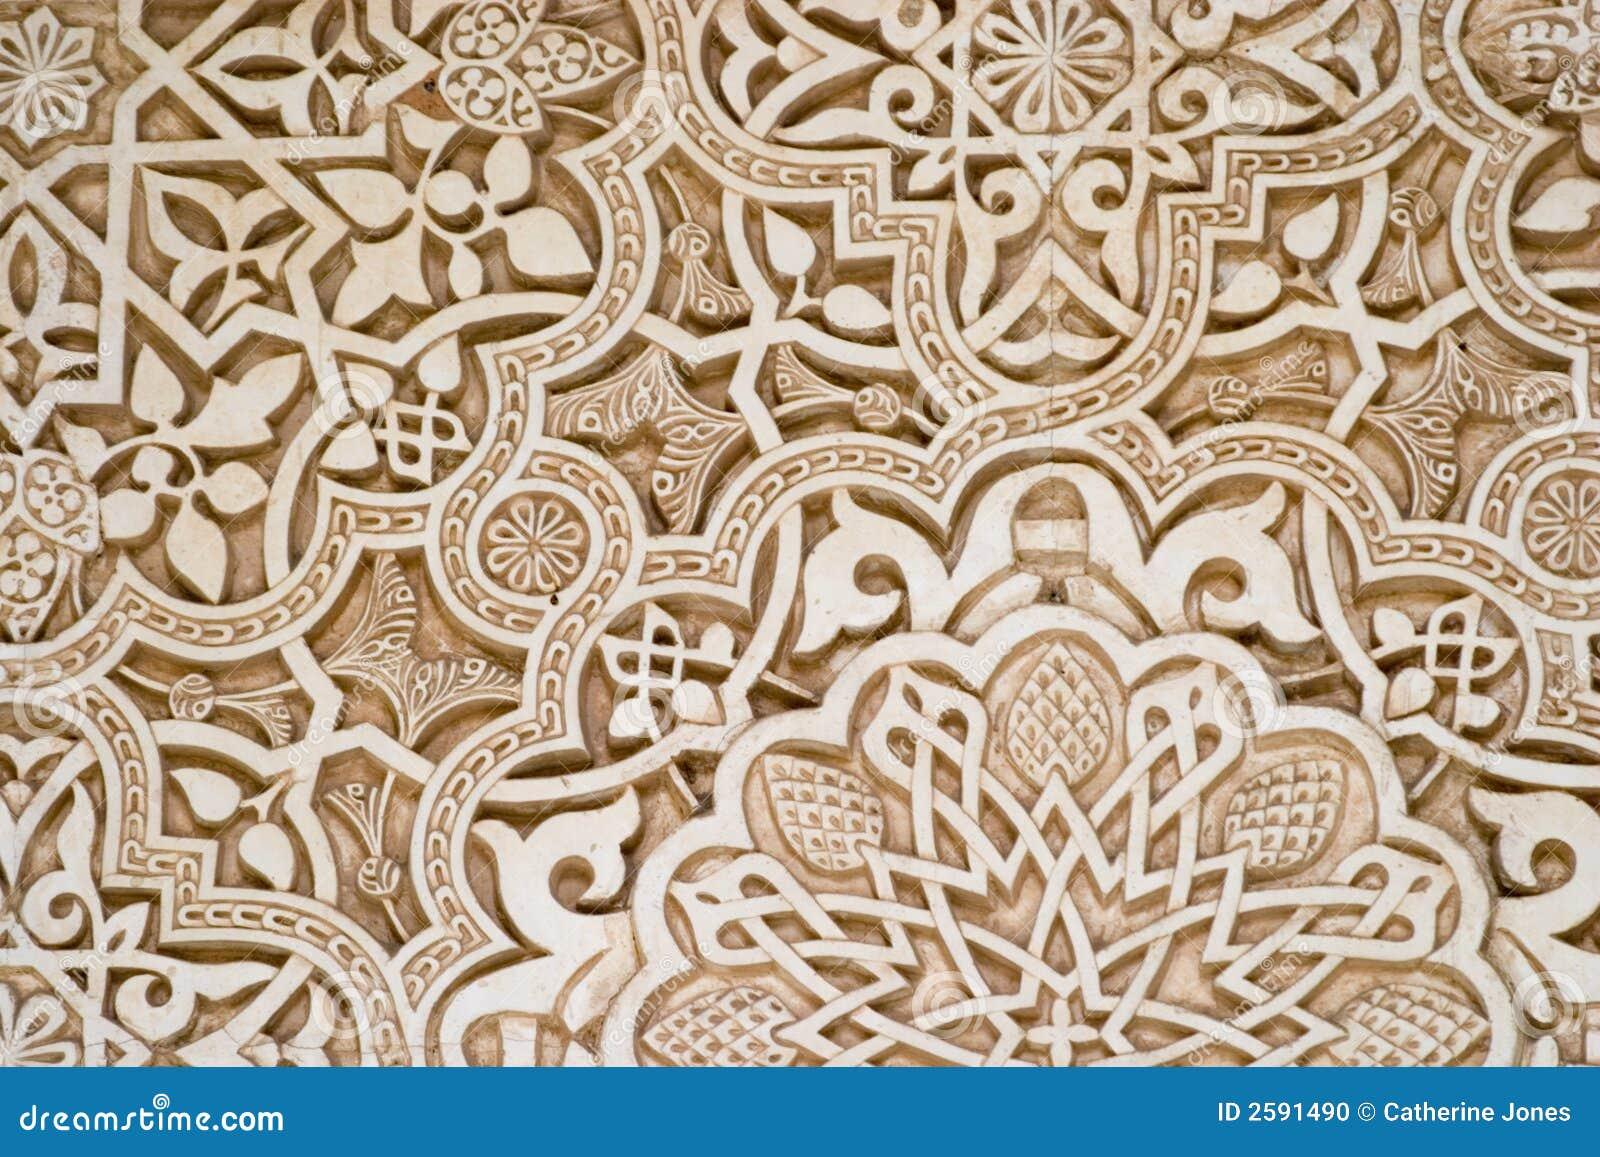 Art islamique - Alhambra